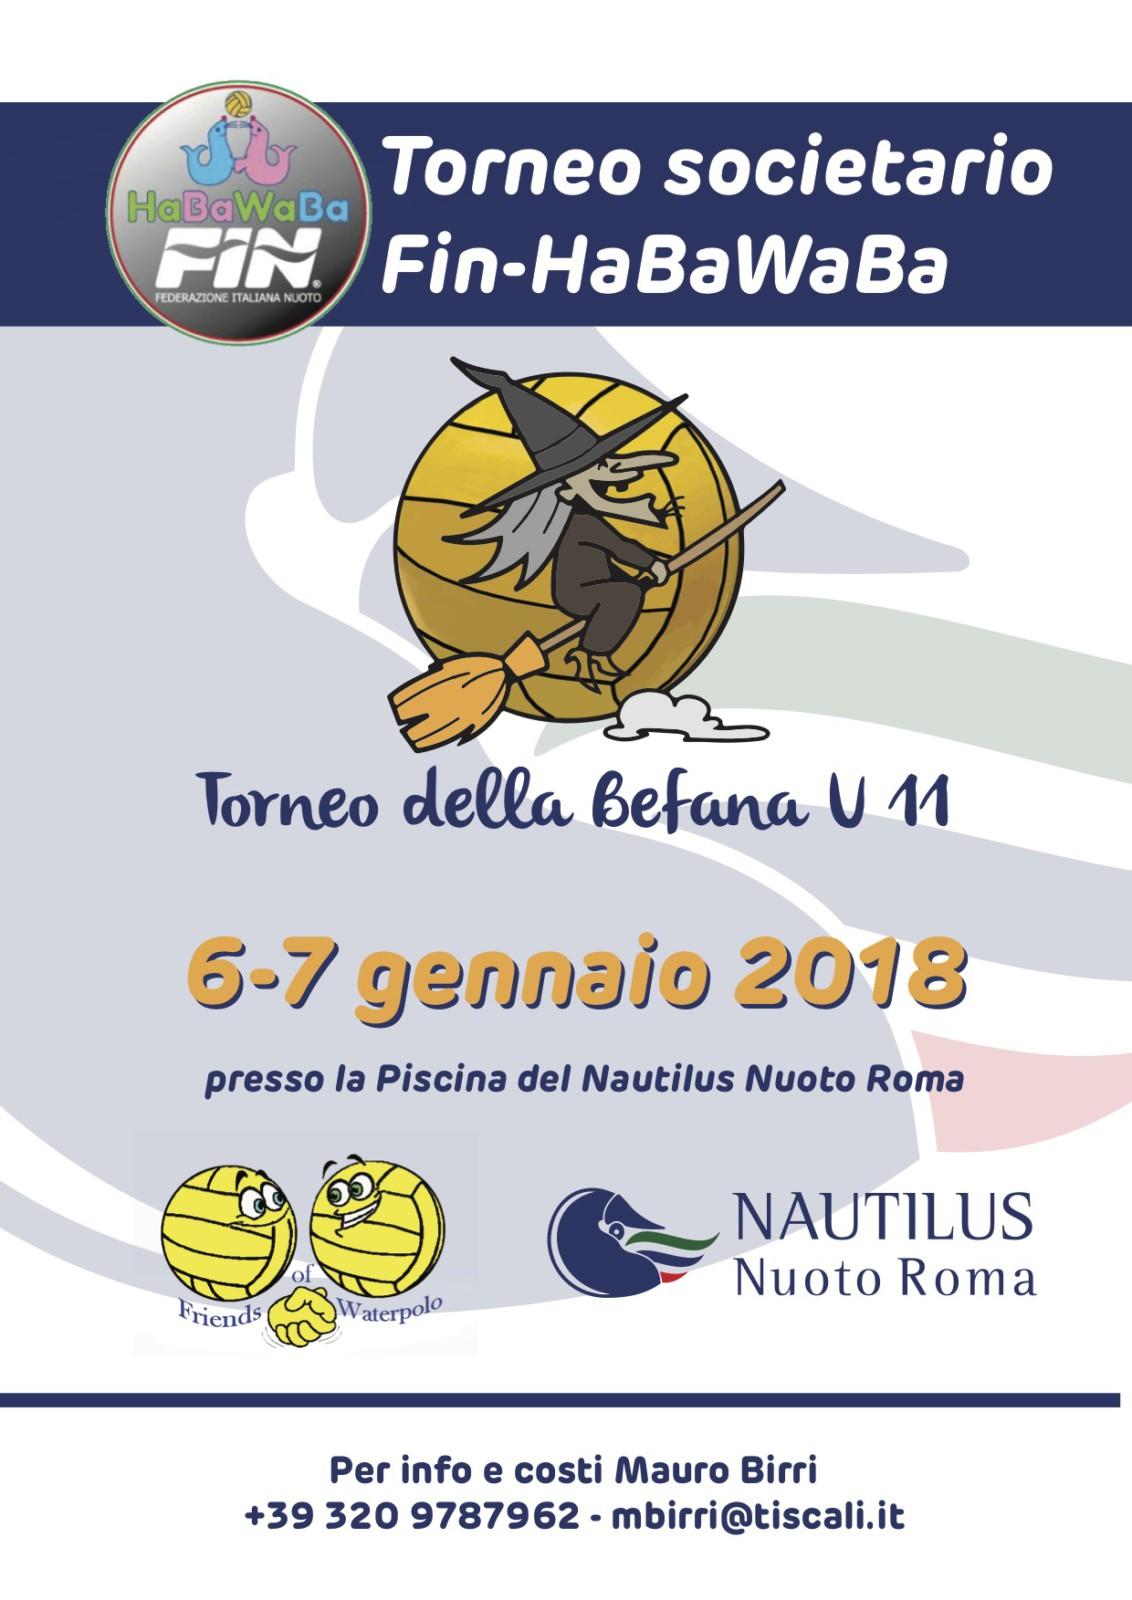 Tornei societari Fin-HaBaWaBa | Roma, 6/7 gennaio 2018